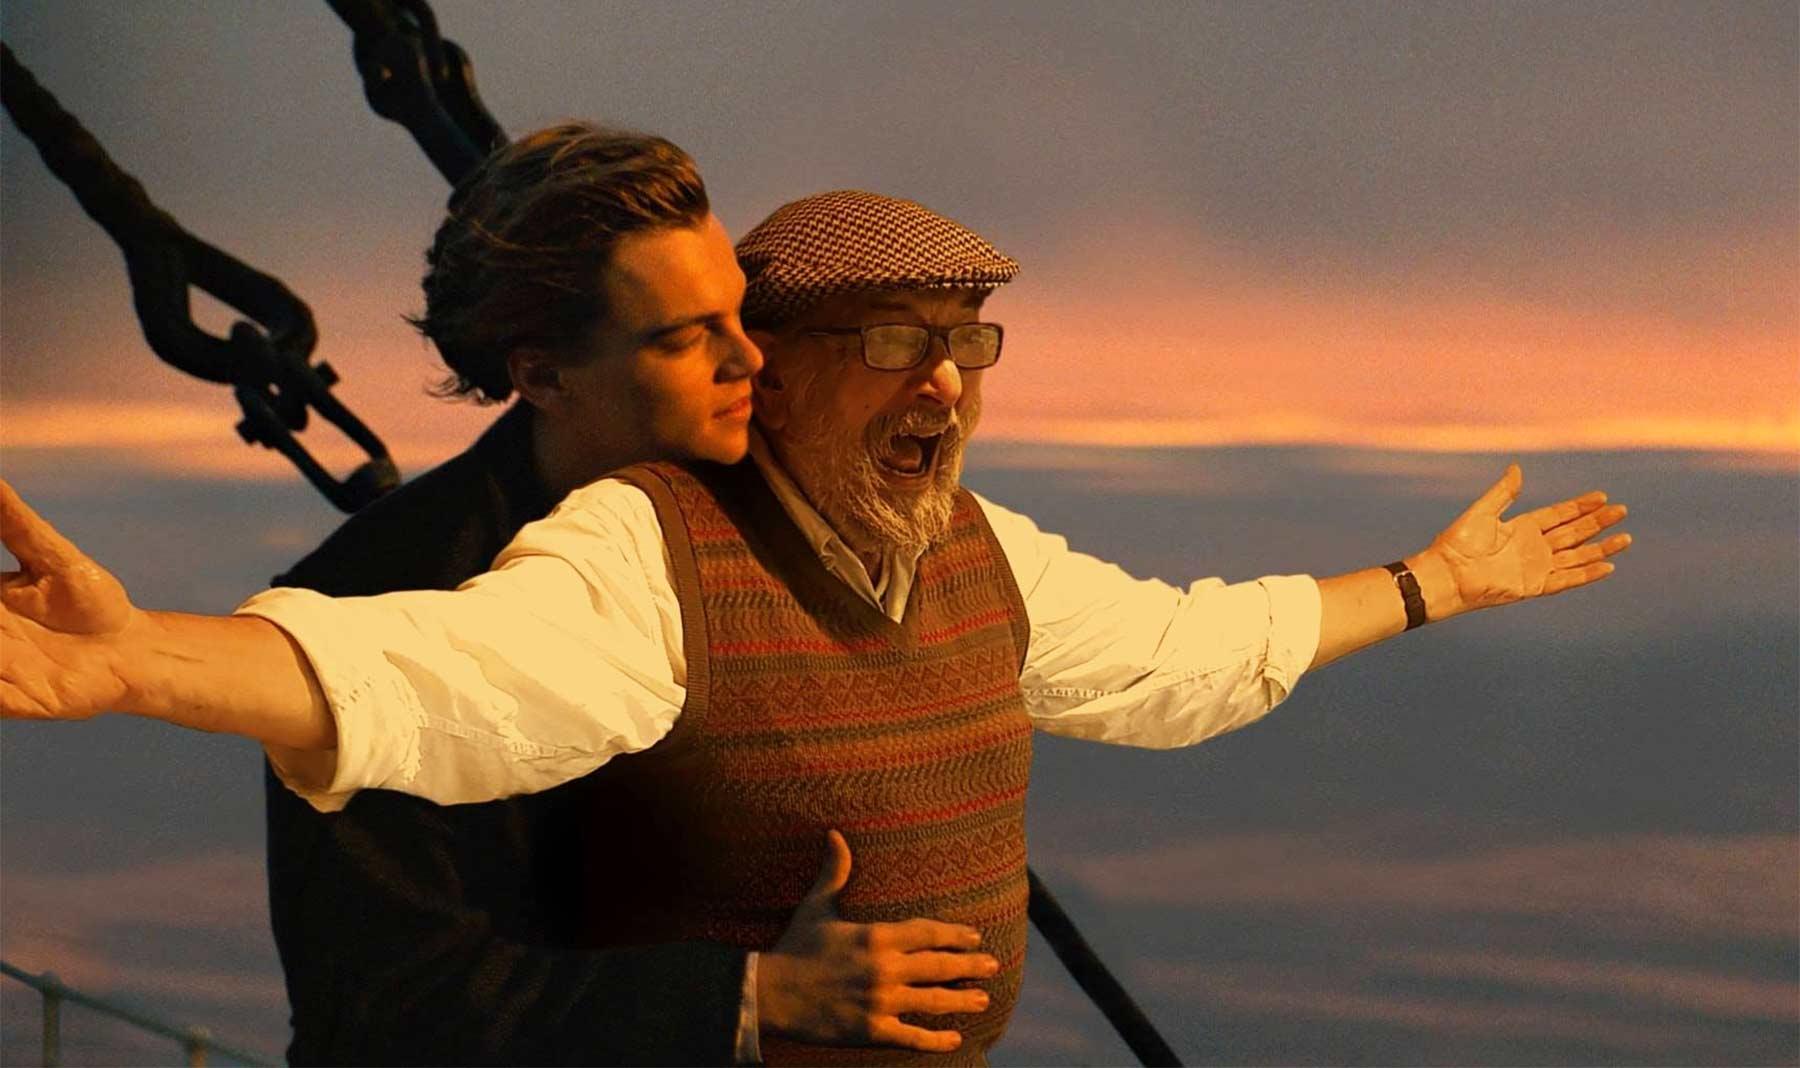 Matt Bonito photoshoppt seinen Vater in berühmte Szenen